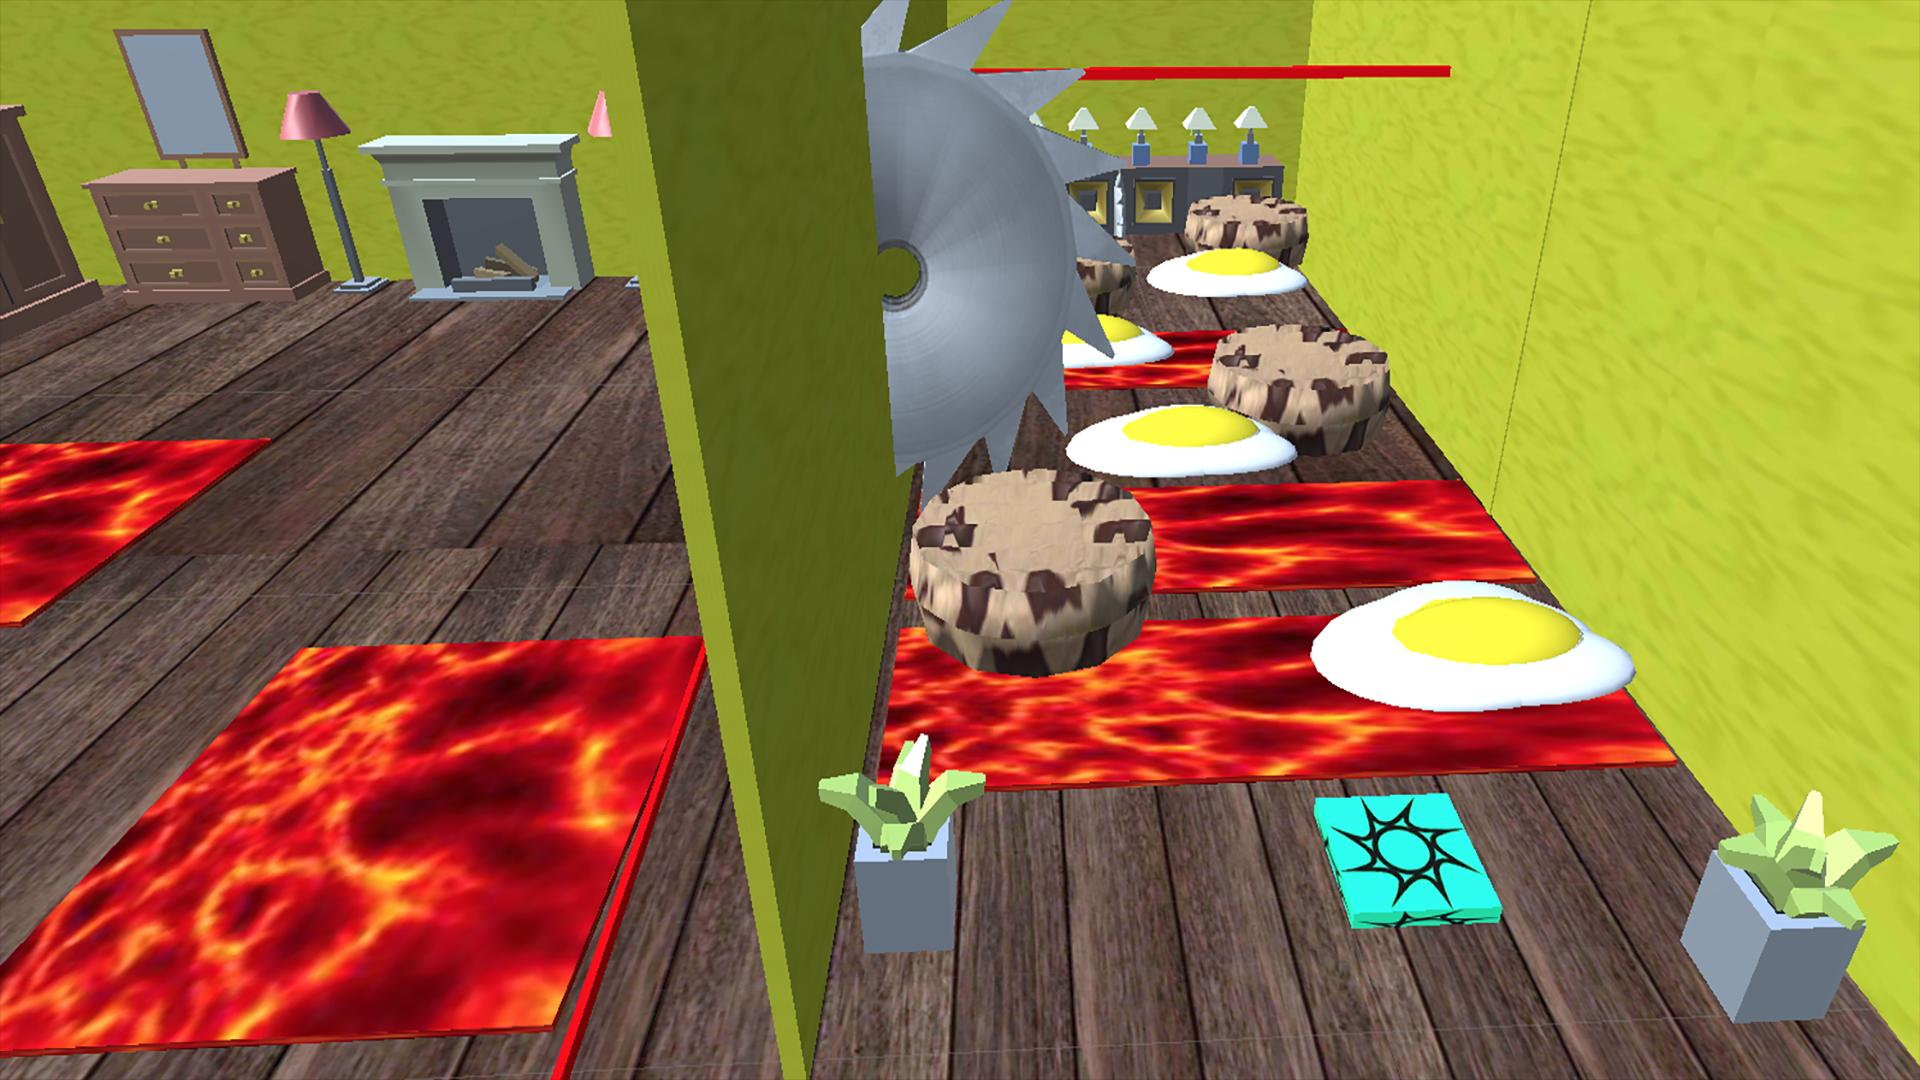 Crazy cookie swirl c robIox adventure 1.2 Screenshot 10